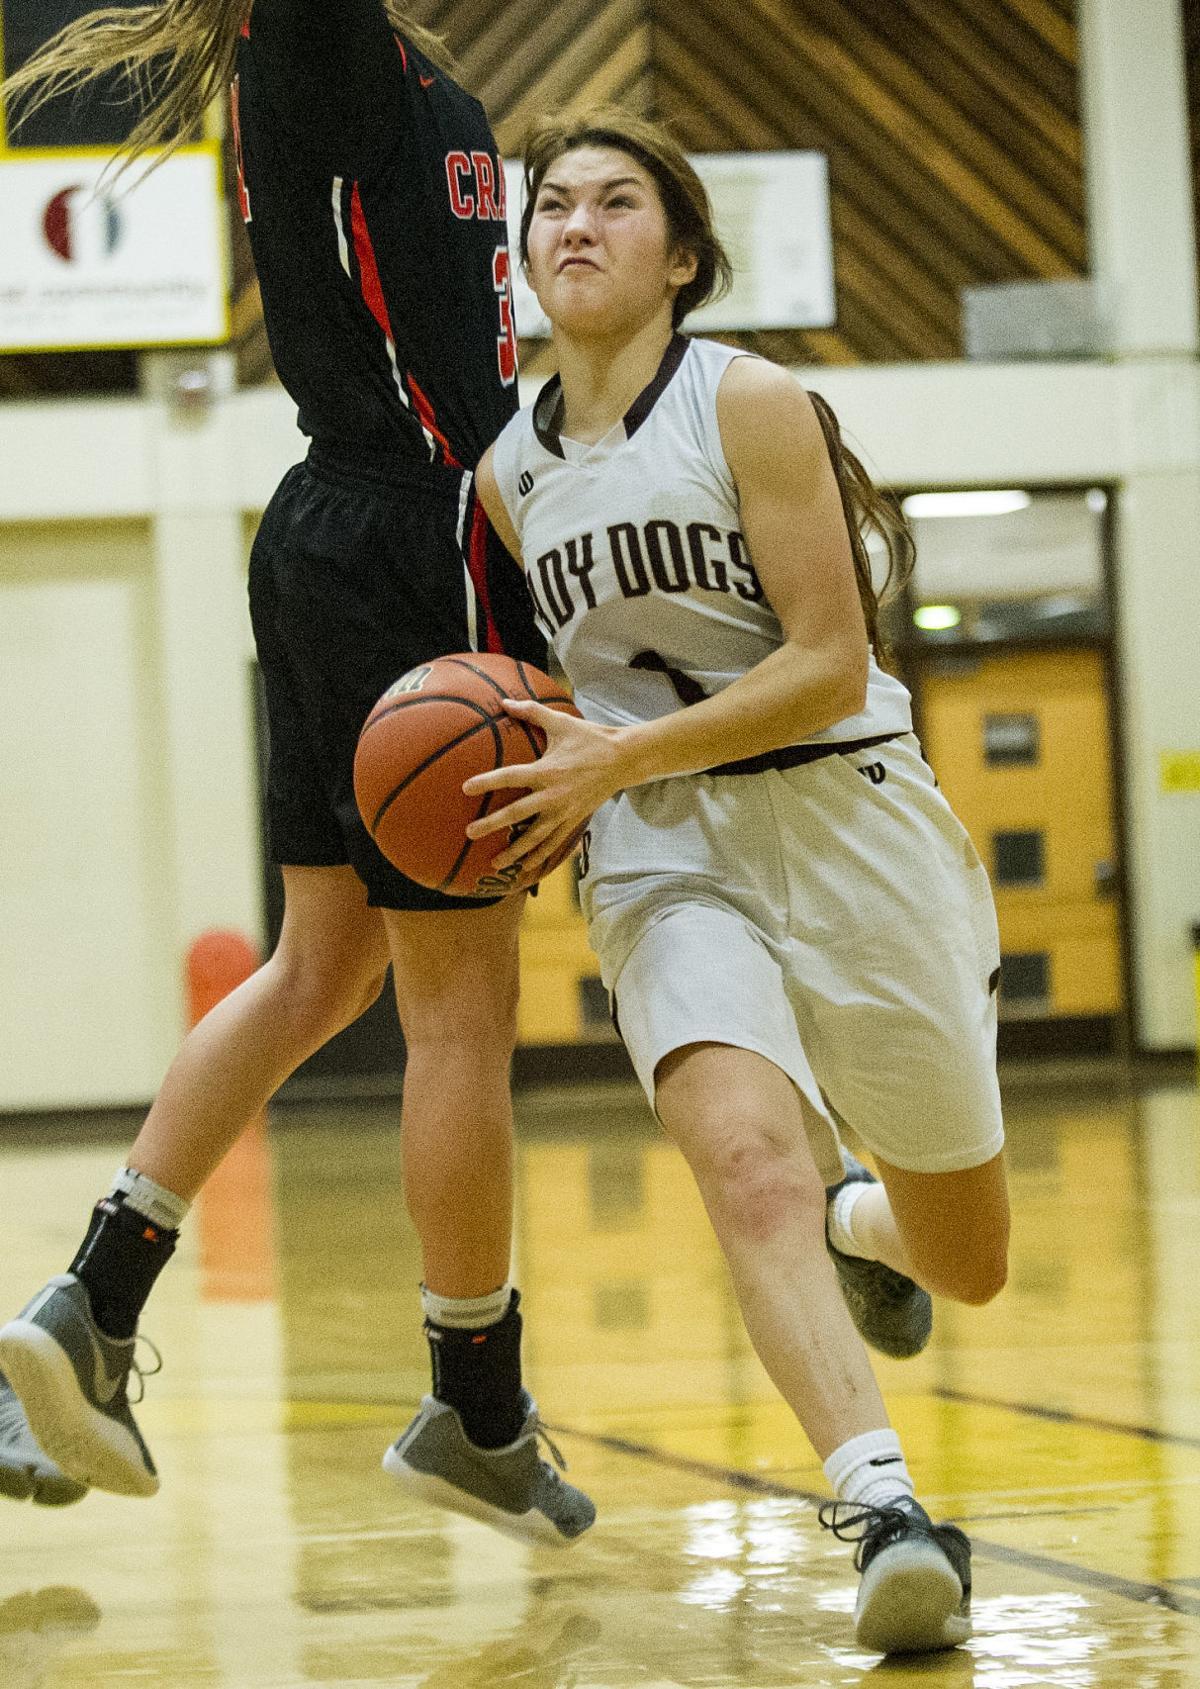 North Bend Girls Basketball